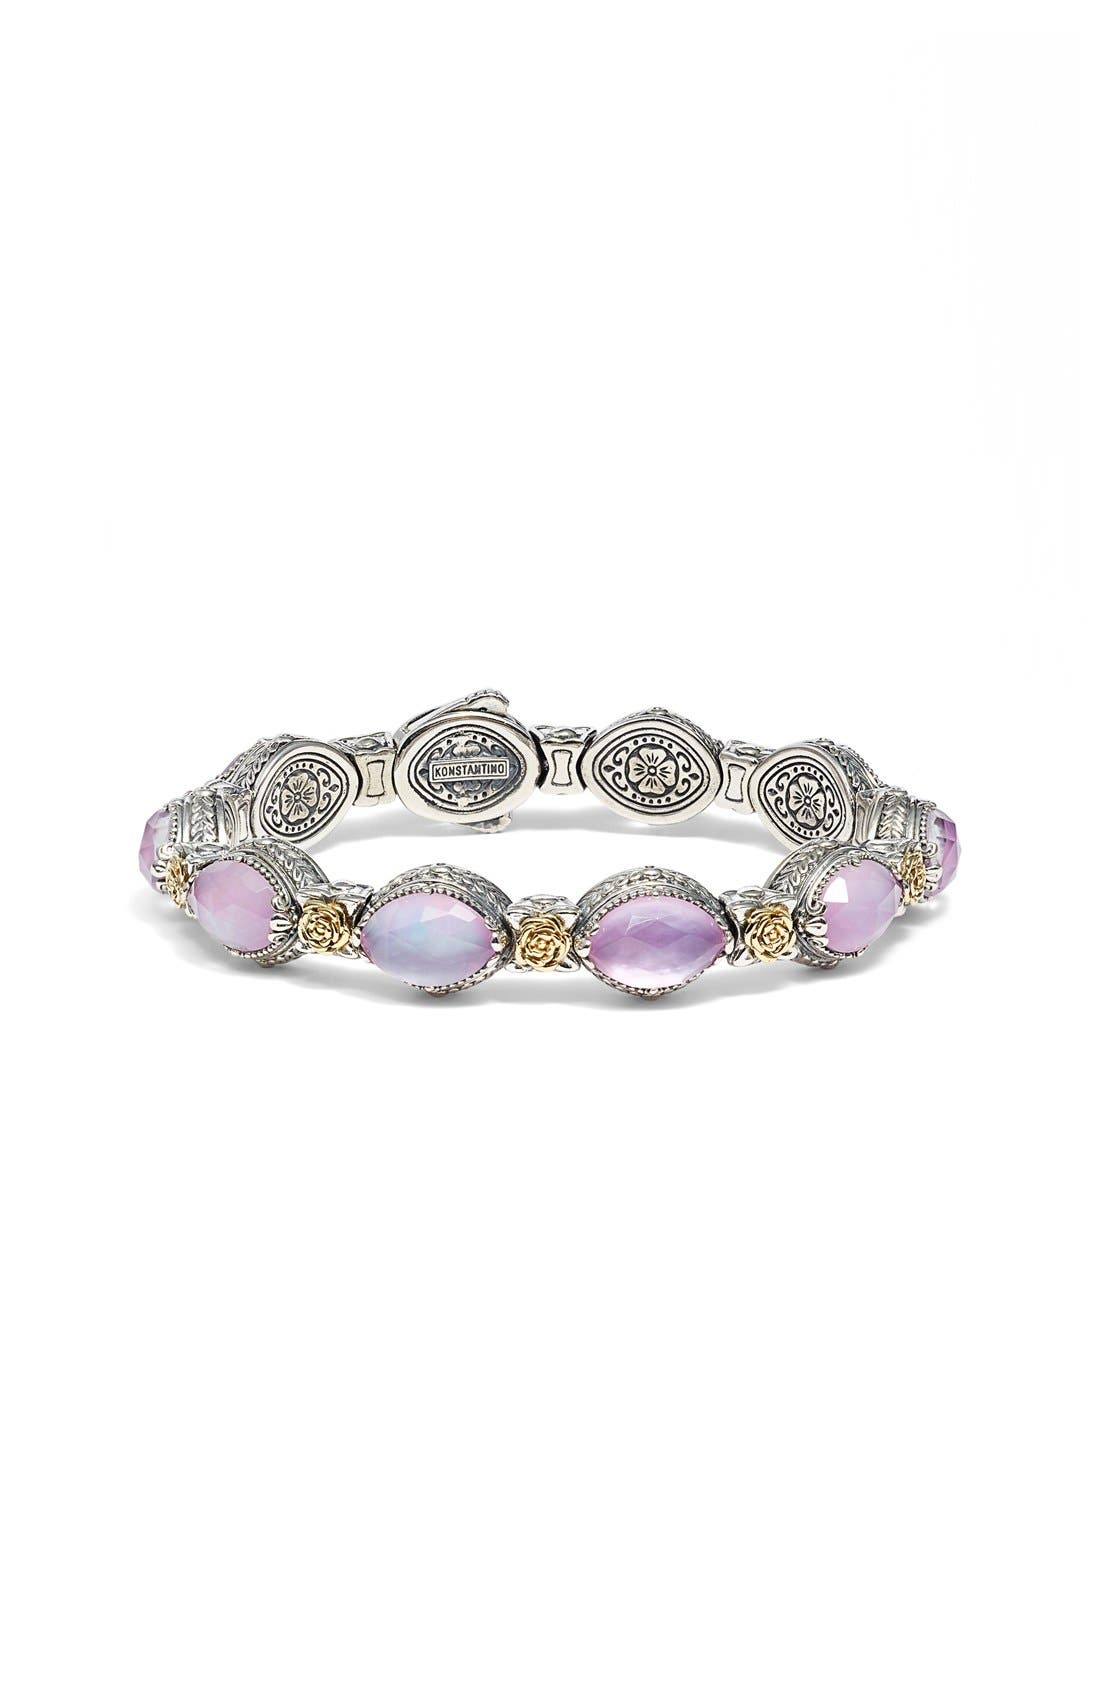 Alternate Image 1 Selected - Konstantino 'Iliada' Stone Link Bracelet